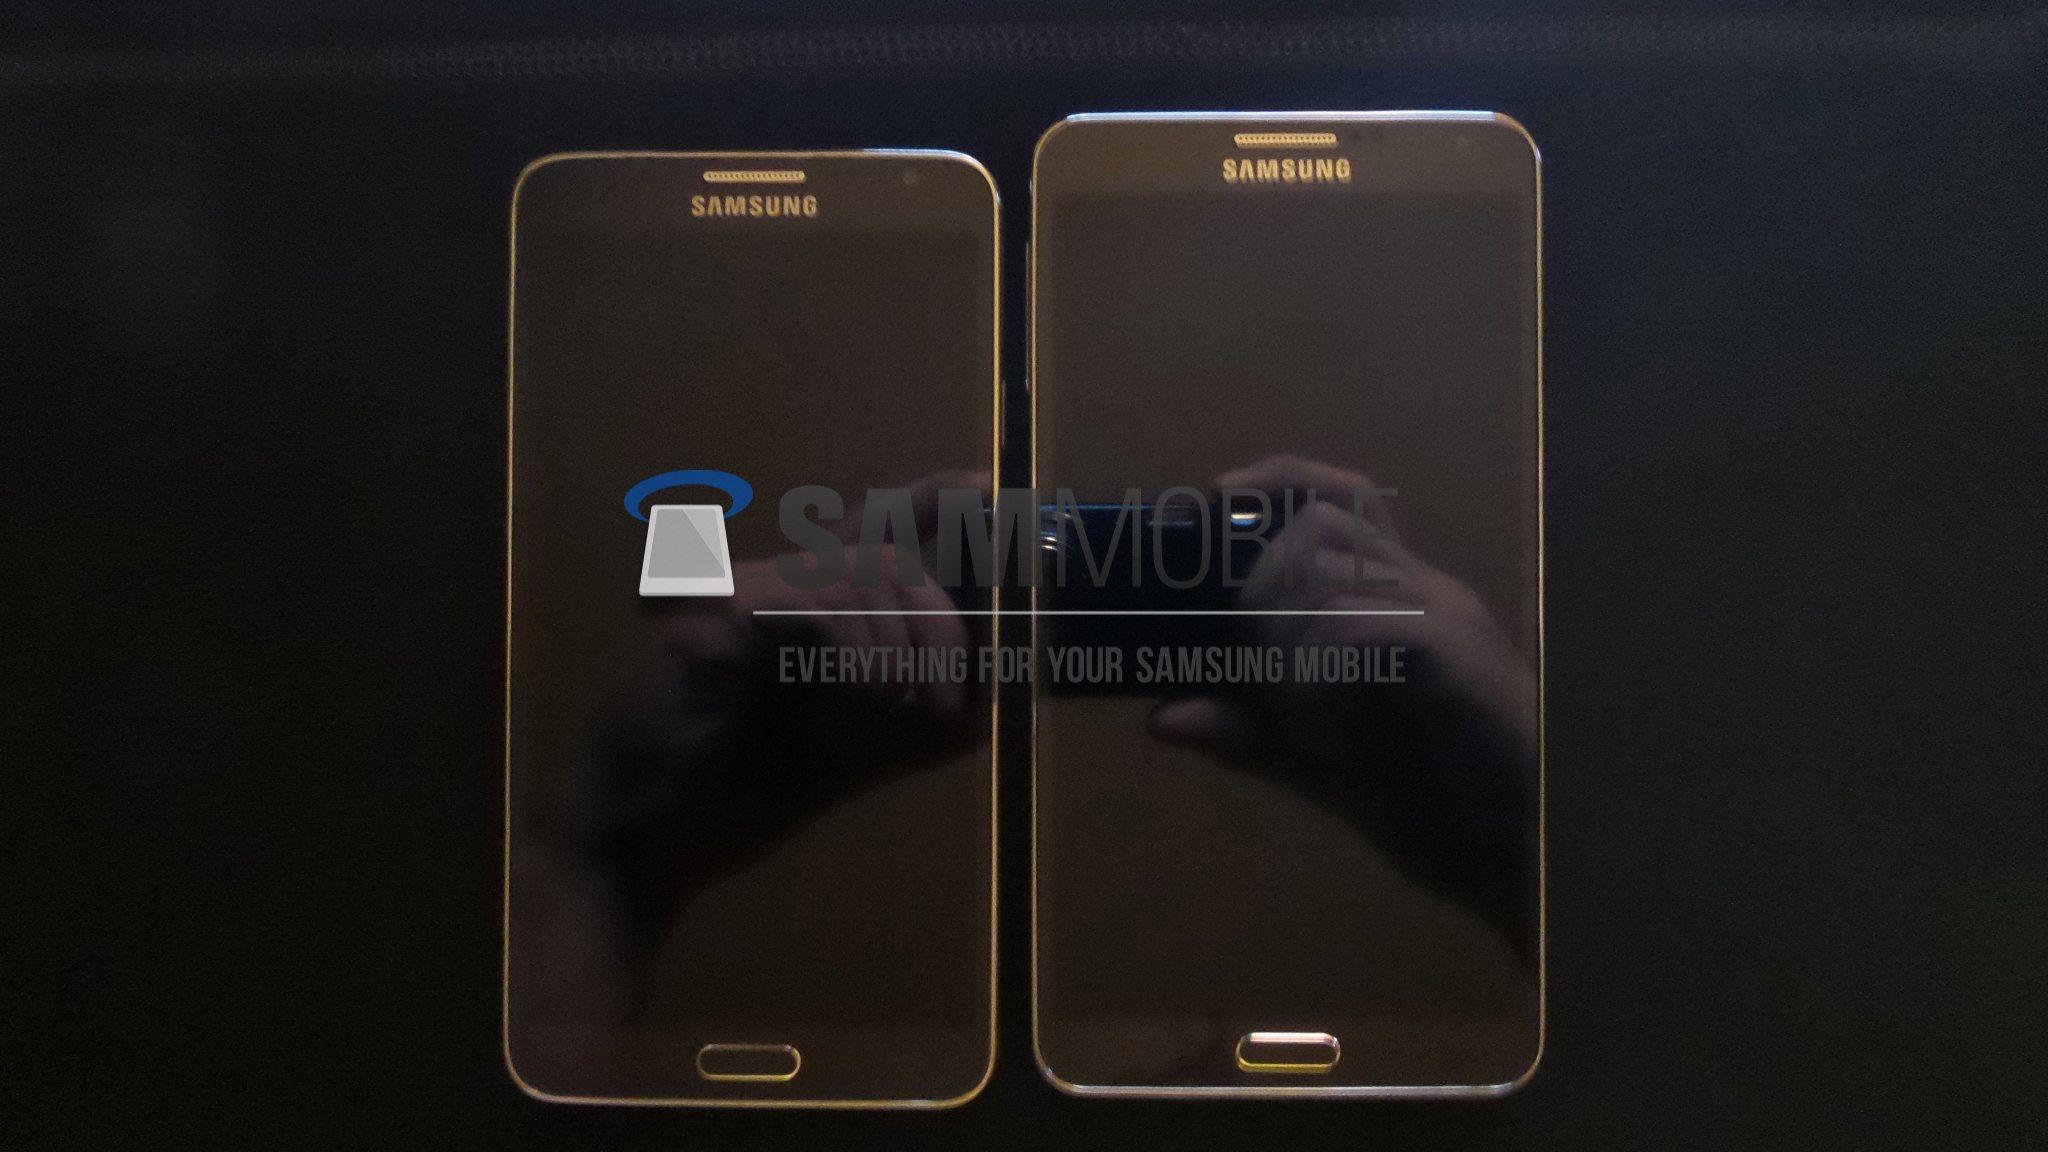 Samsung Galaxy Note 3 - XDA Developers